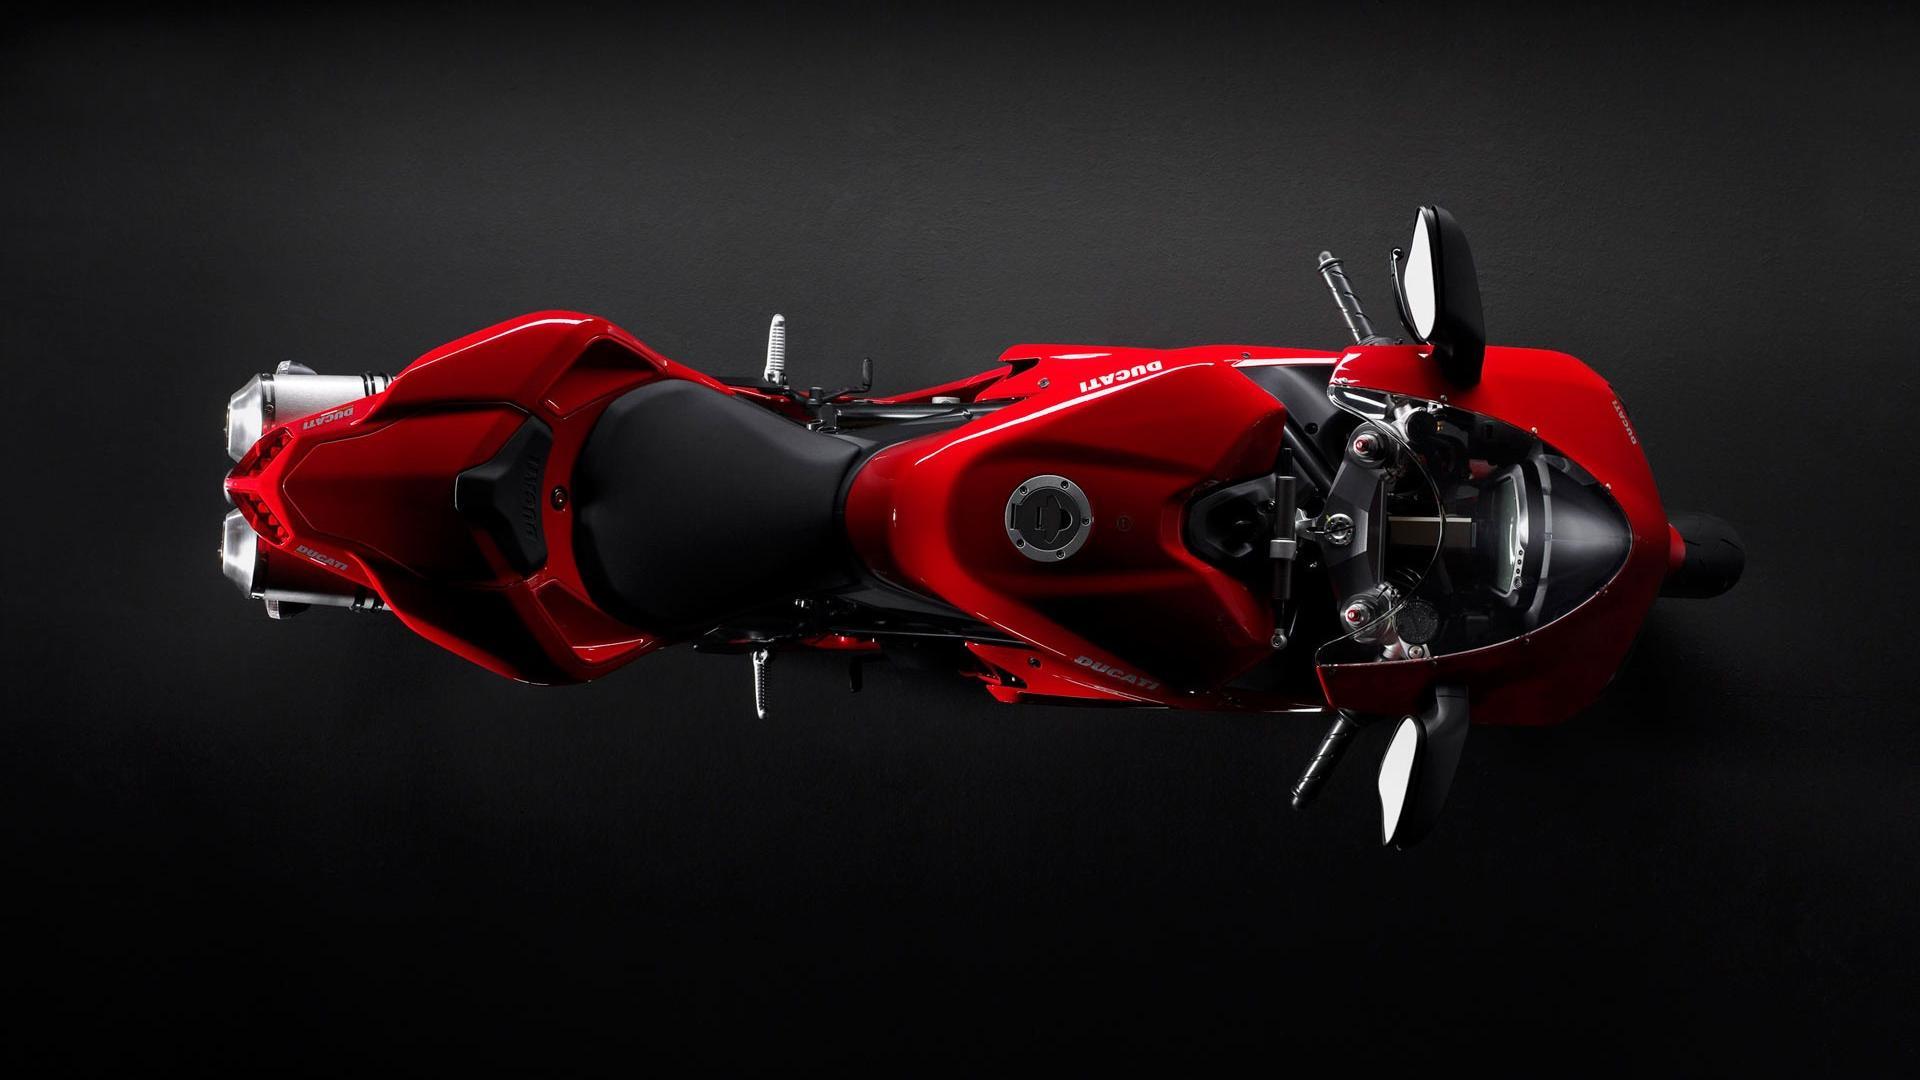 Ducati Wallpaper #10